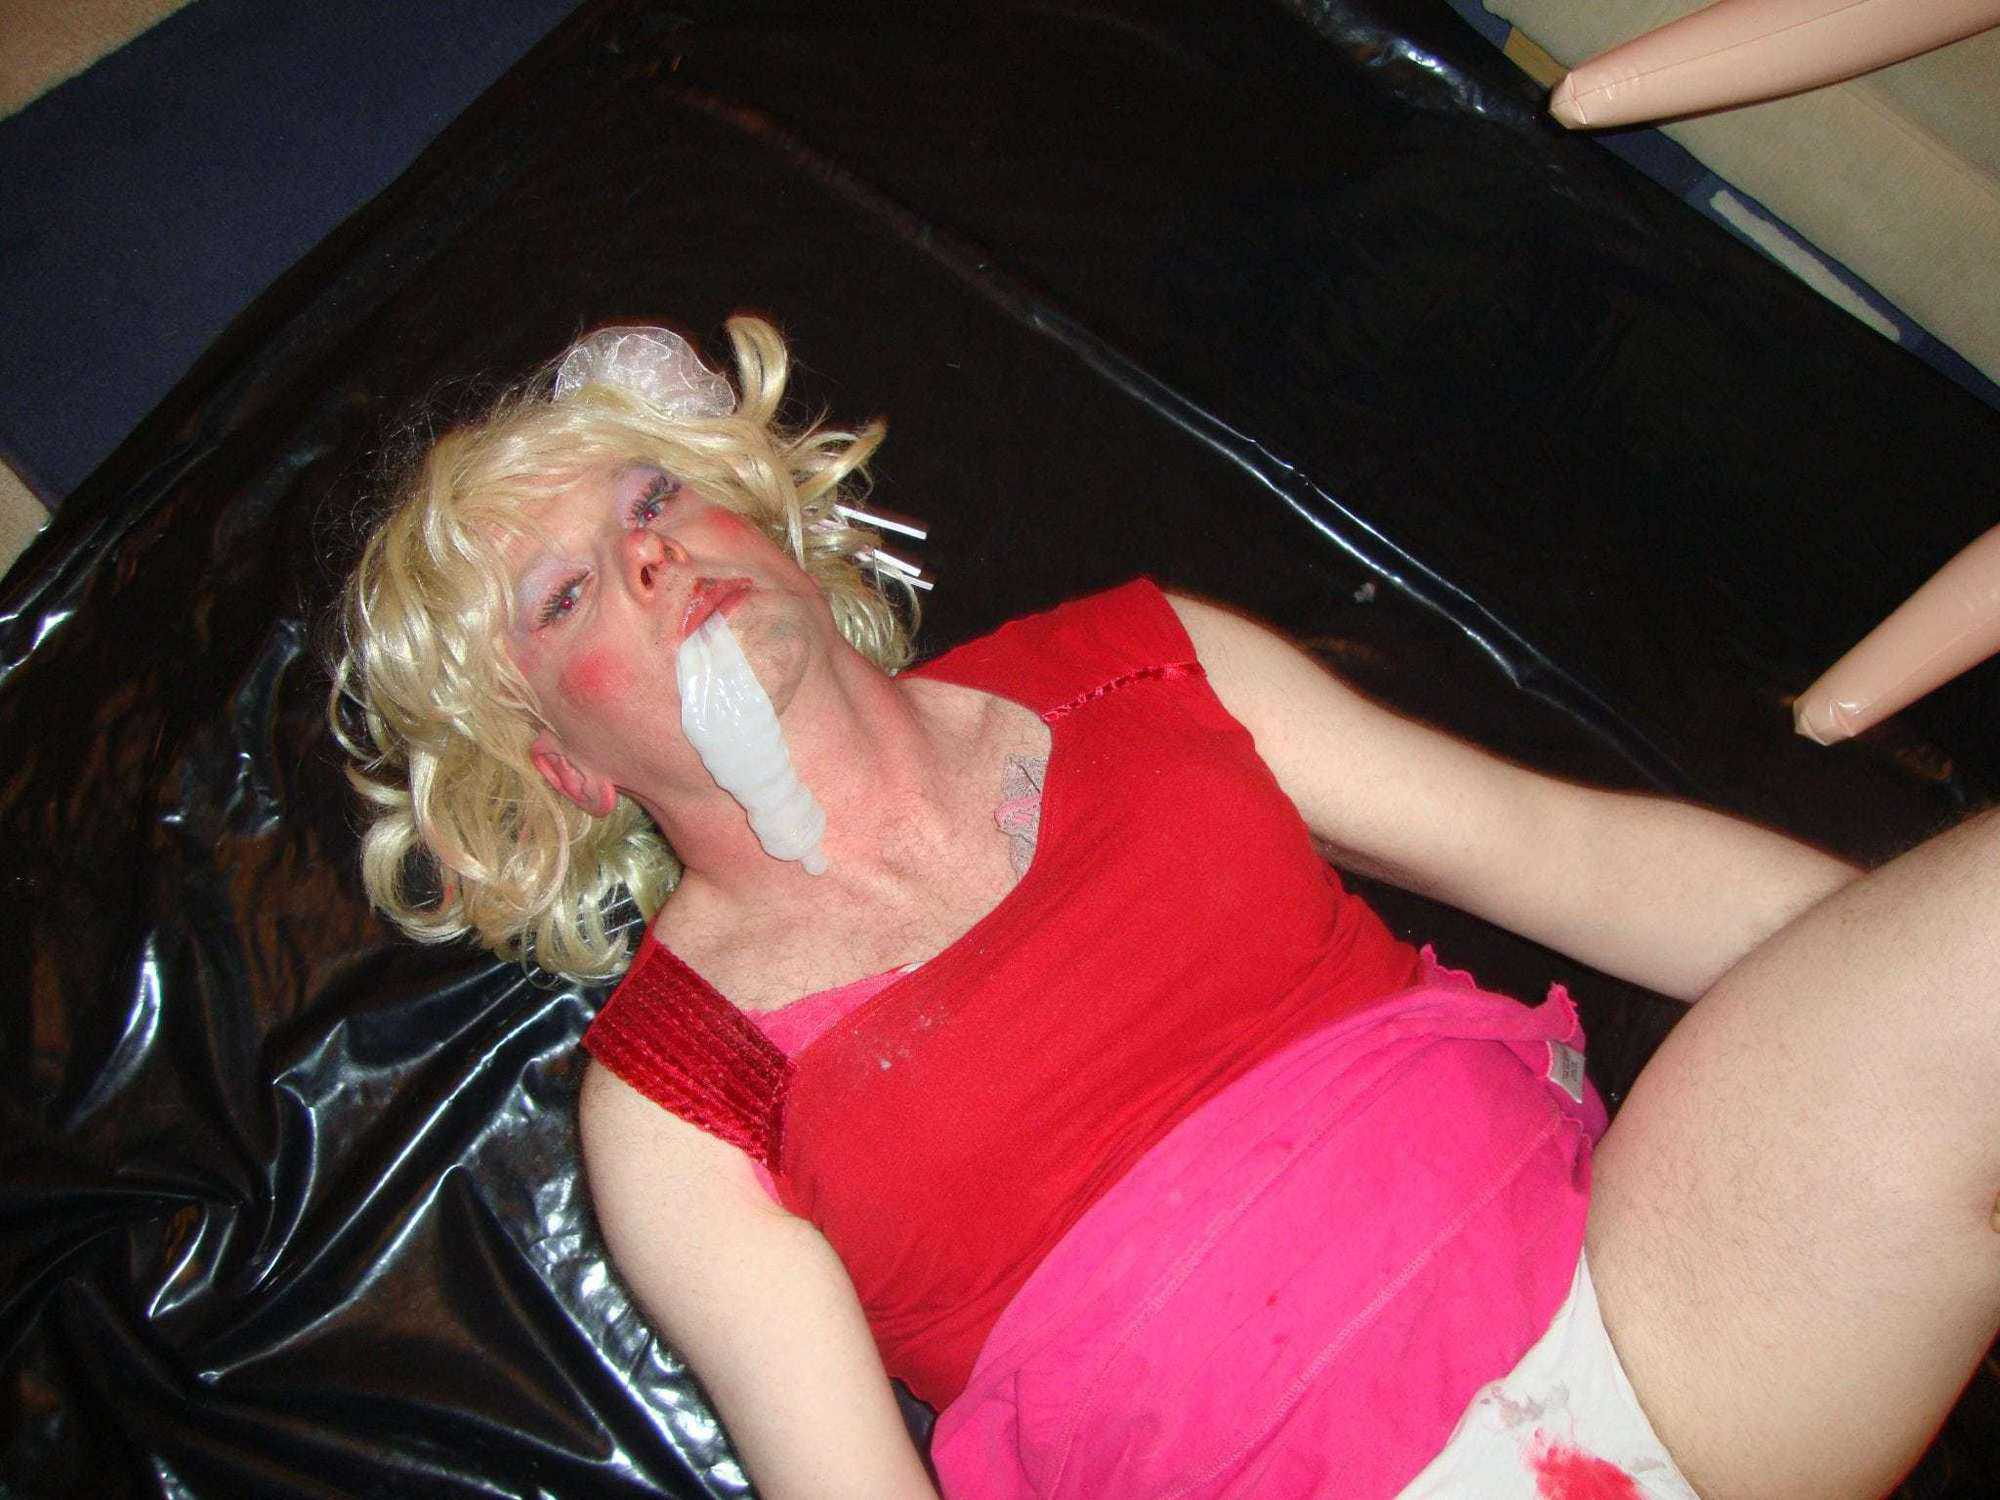 sissy slut humiliated, cum eating bitch